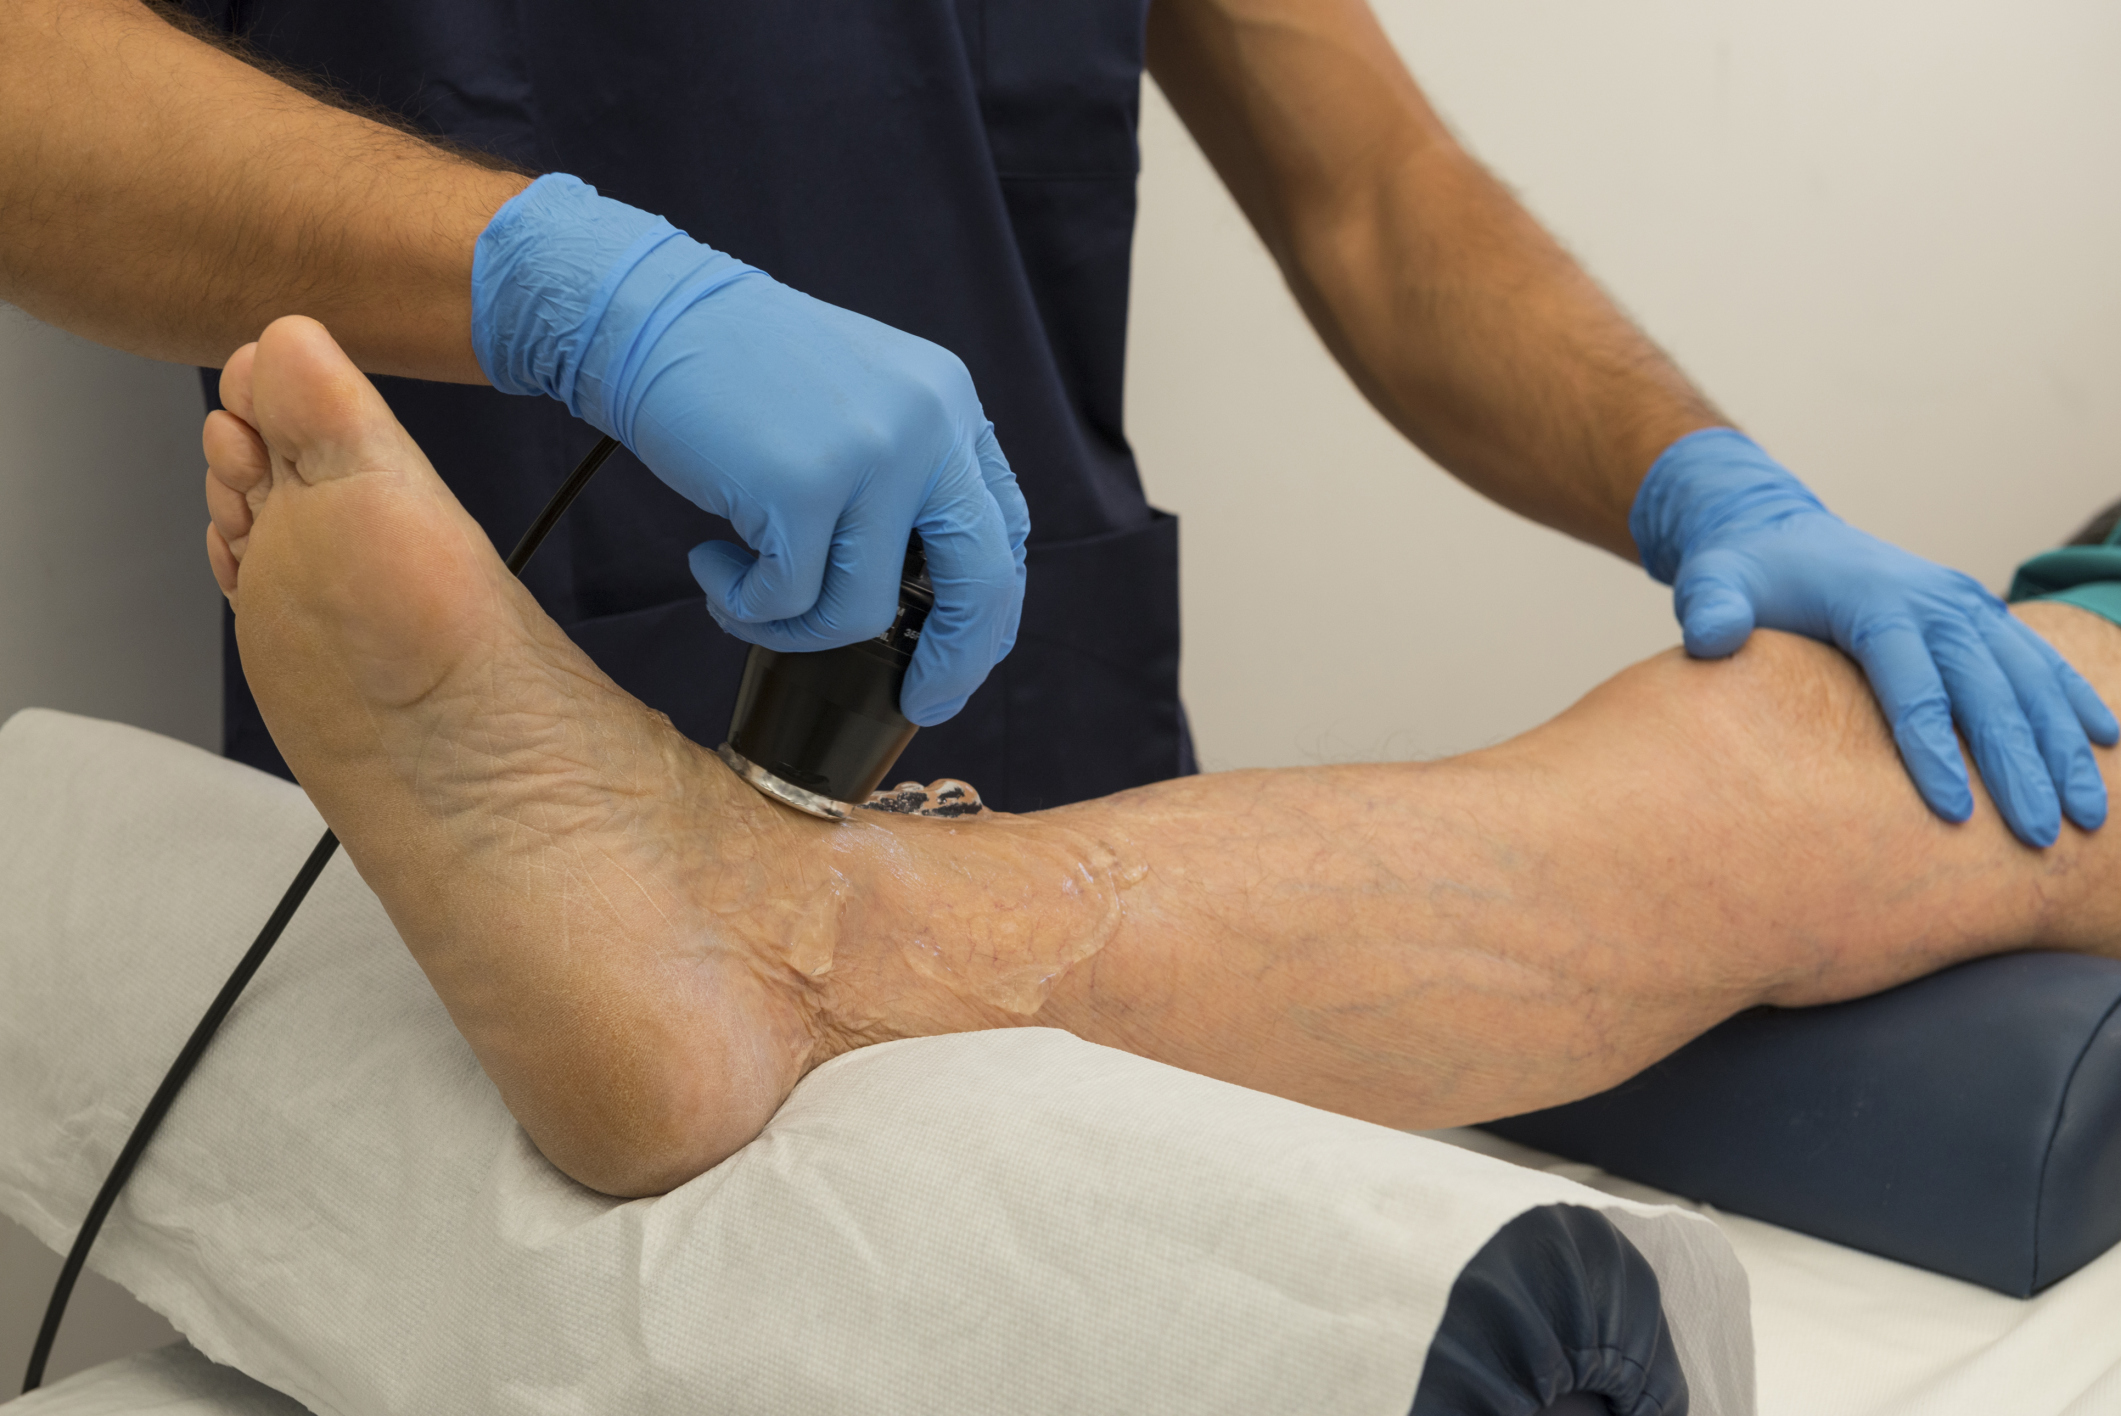 Артроз суставов лечение в домашних условиях 461